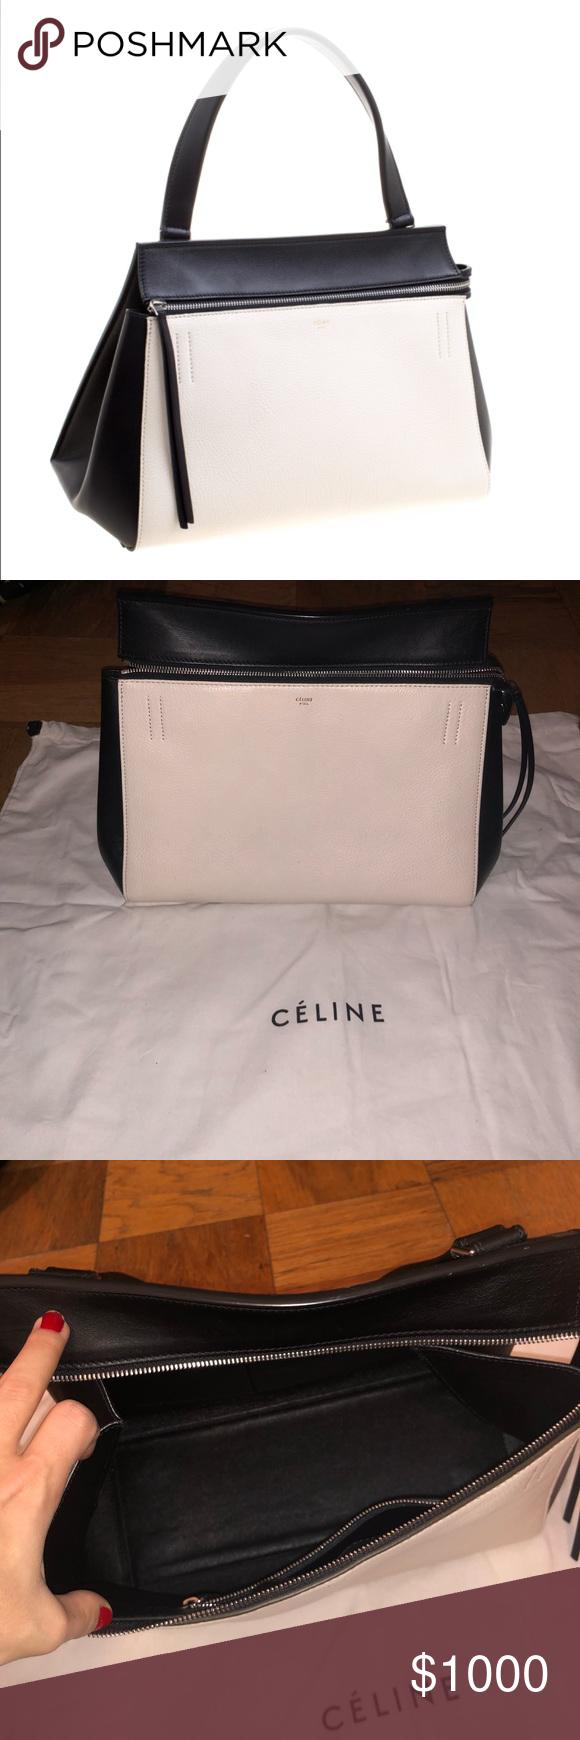 a8939ee641 Céline Médium Edge one shoulder bag Constructed in a neat silhouette